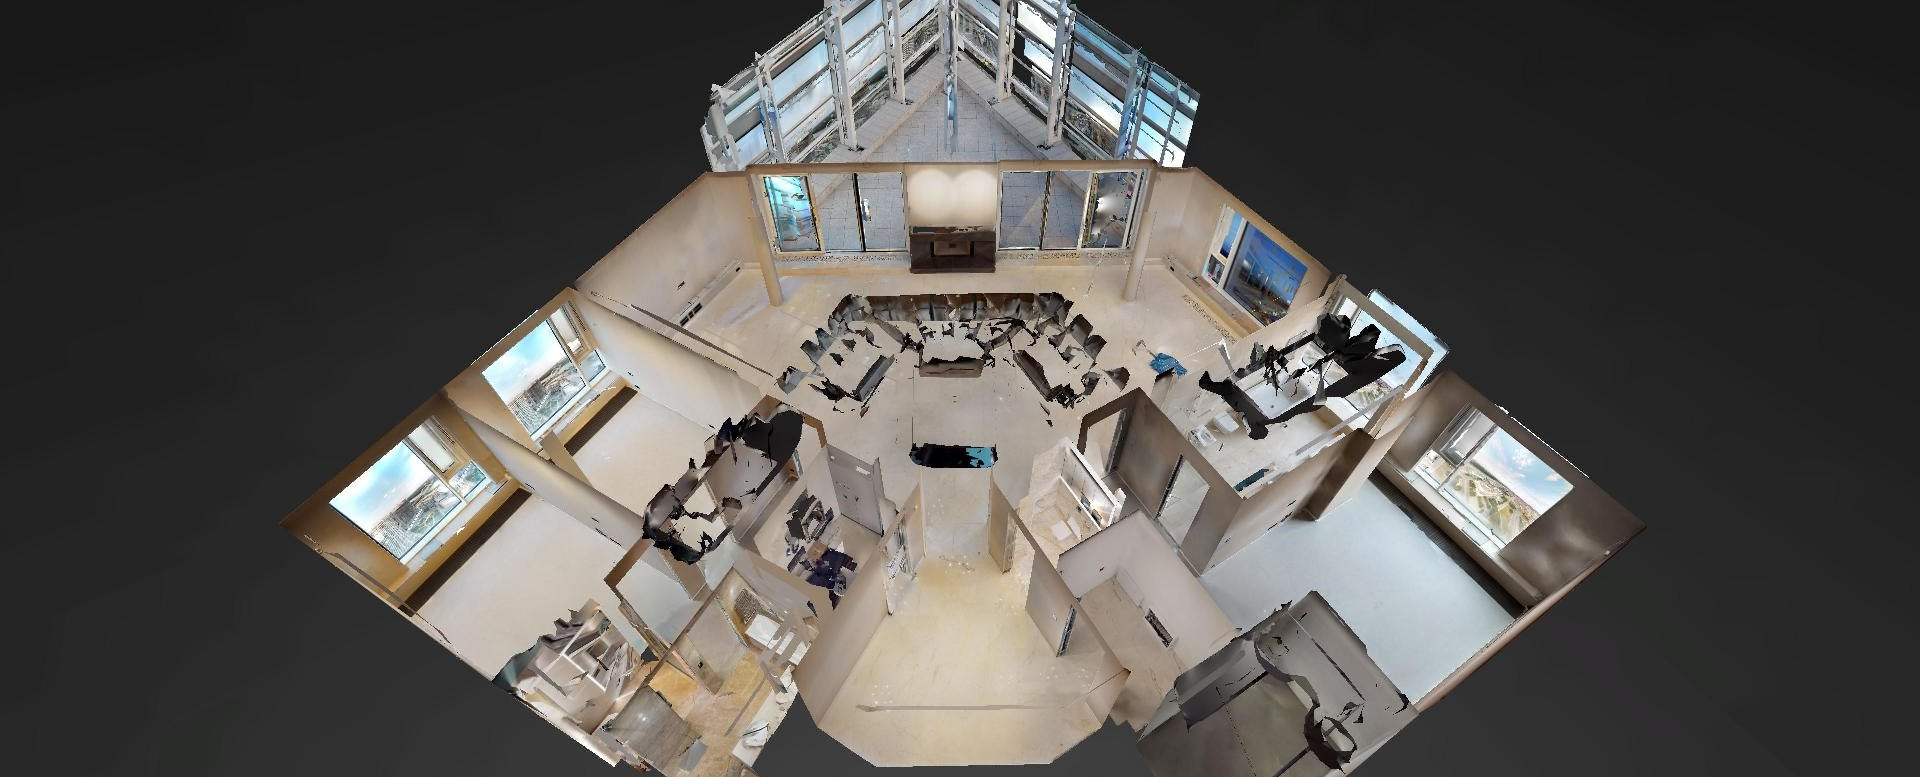 3D pôdorys penthousu v Panorama Towers - Eurovea City